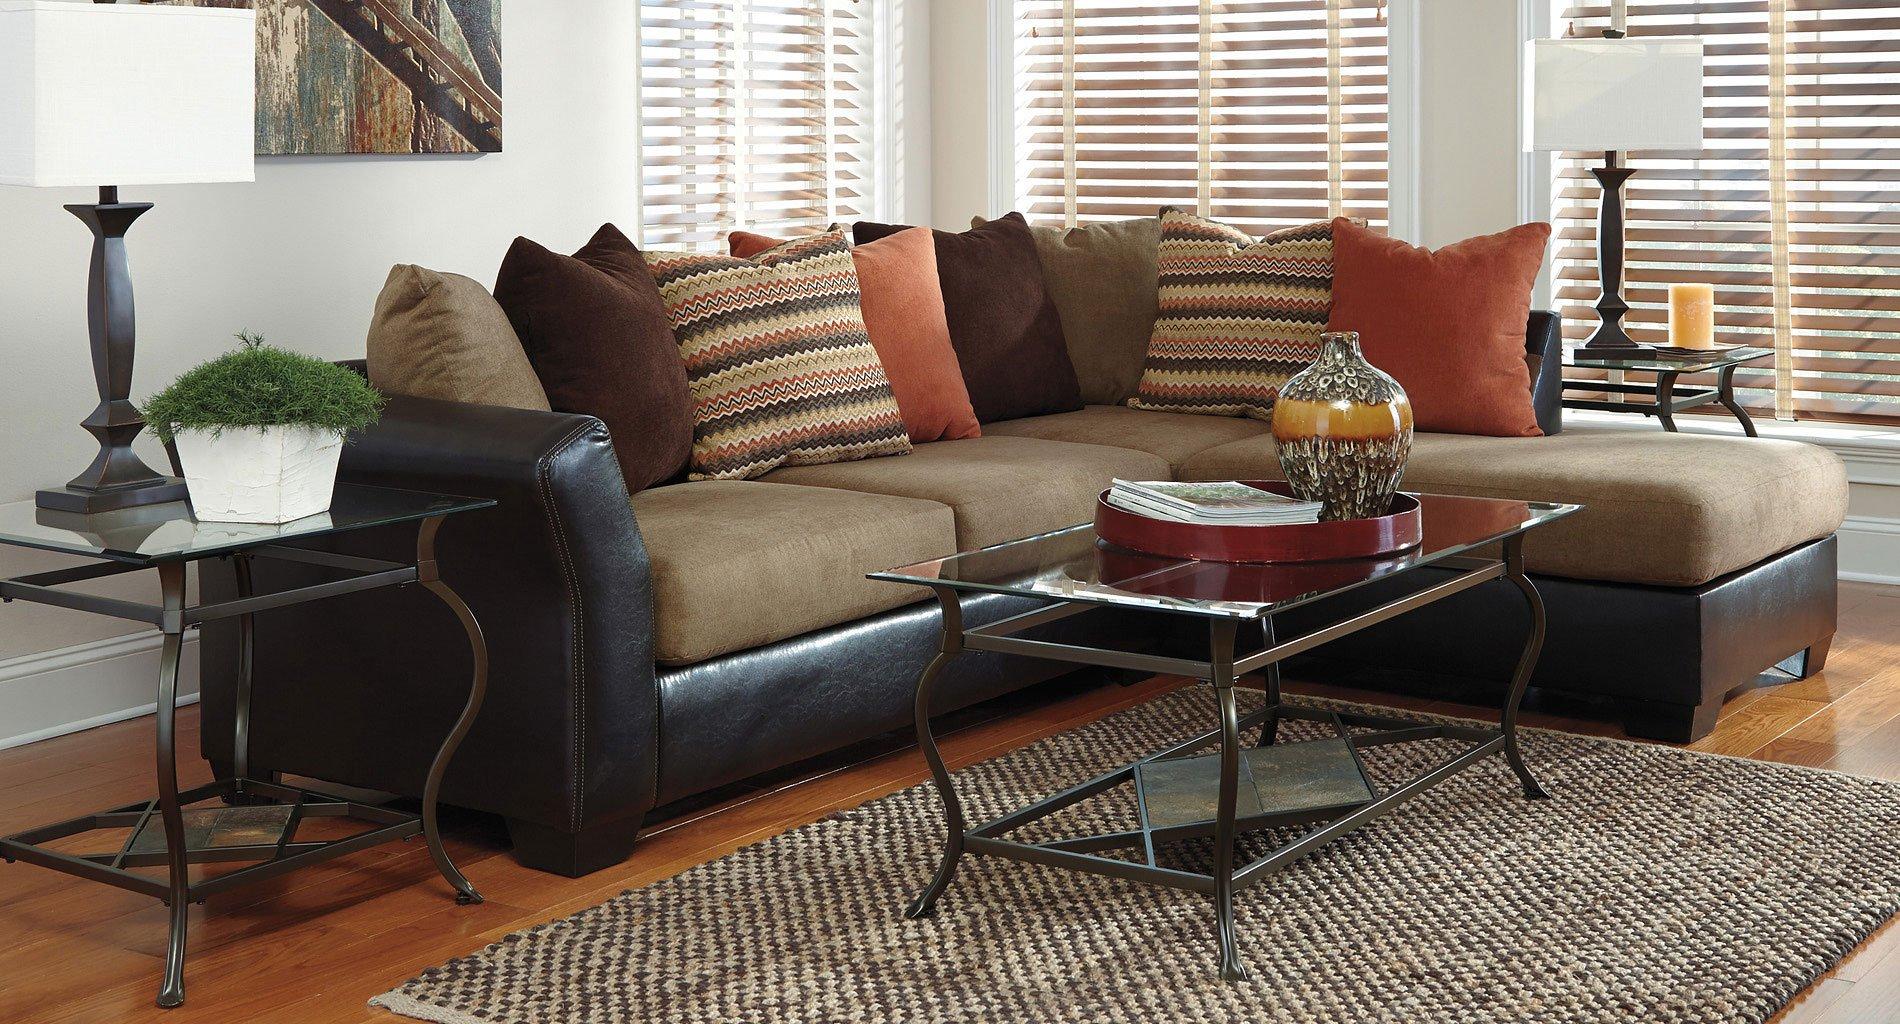 armant mocha sectional living room set by signature design by ashley 1 reviews furniturepick. Black Bedroom Furniture Sets. Home Design Ideas